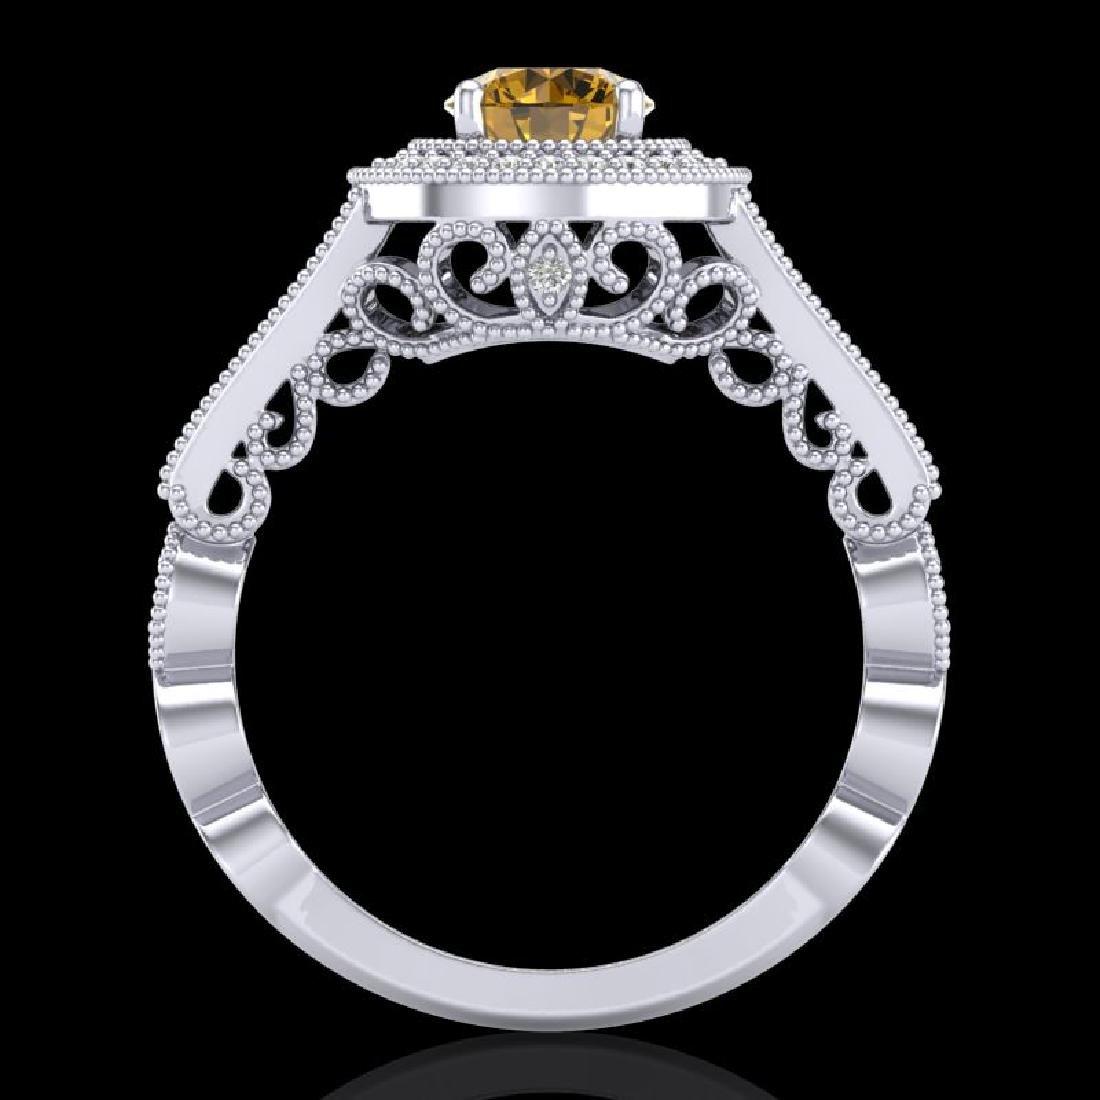 1.12 CTW Intense Fancy Yellow Diamond Engagement Art - 3